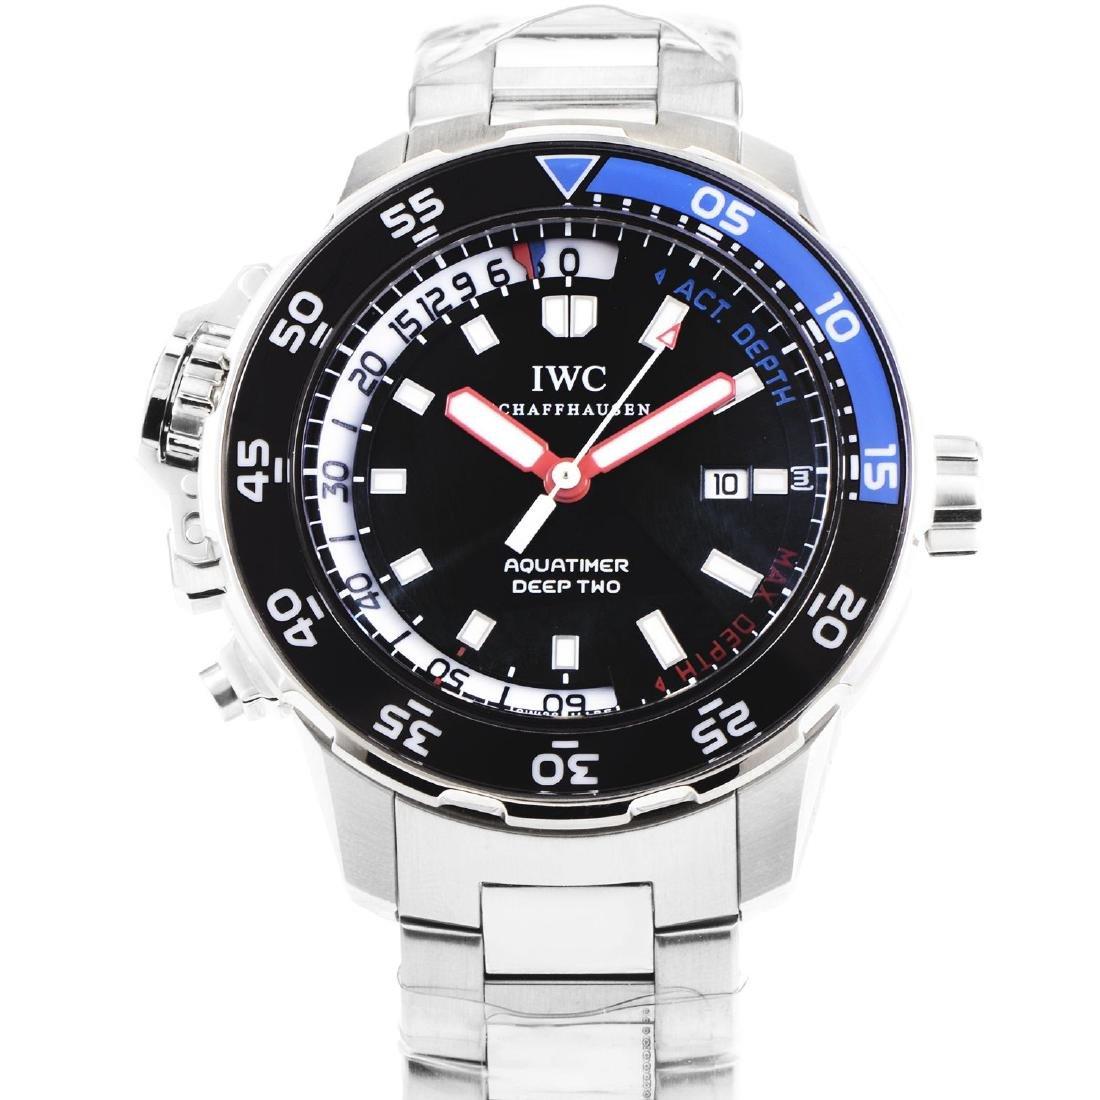 IWC Aquatimer Deep Two